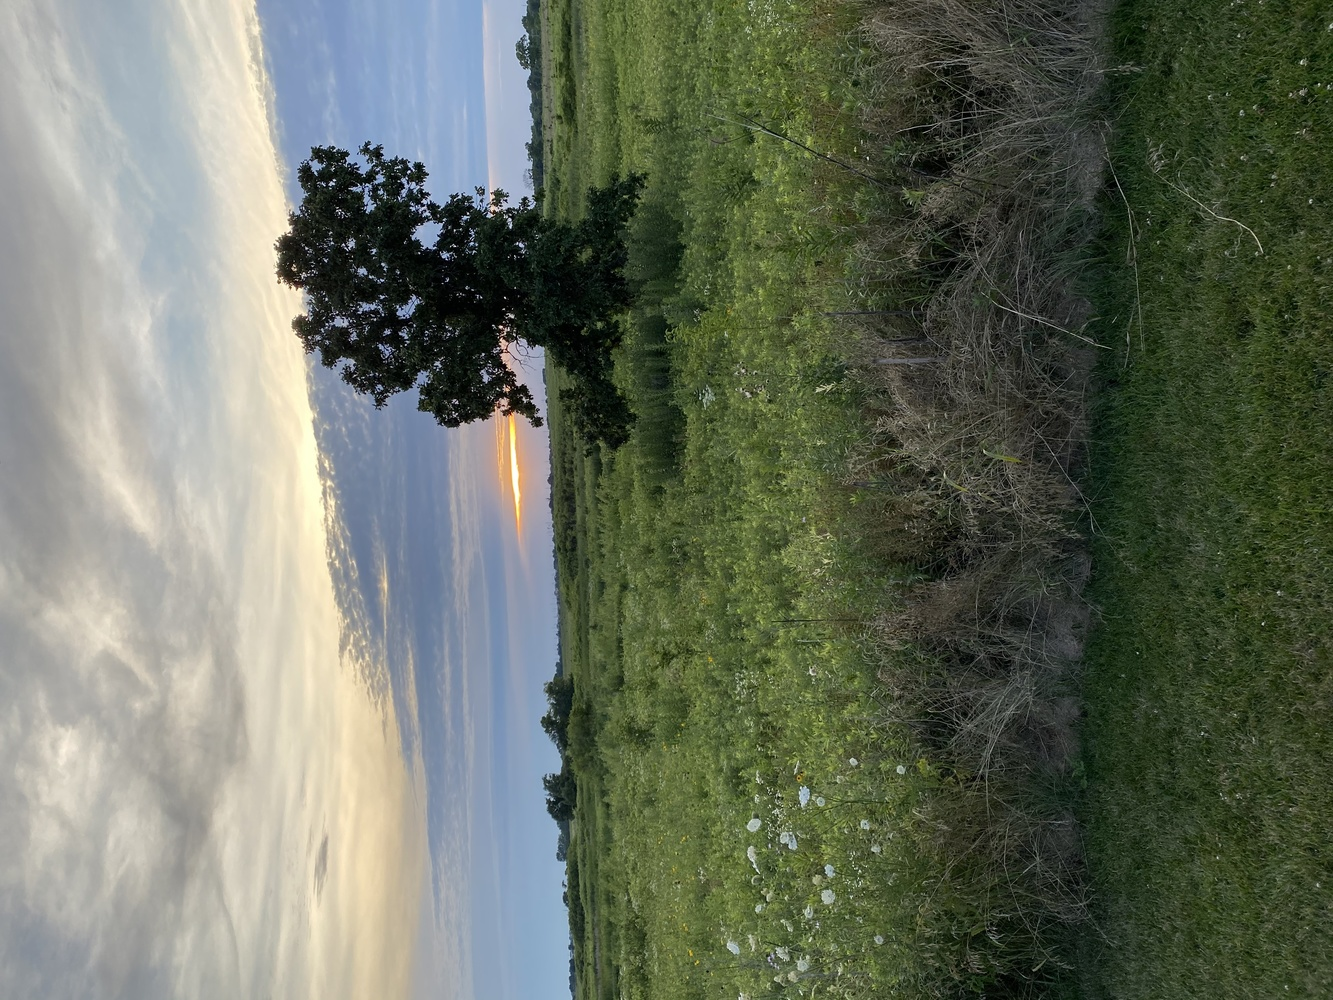 Sunset Tree by Rohit Burra